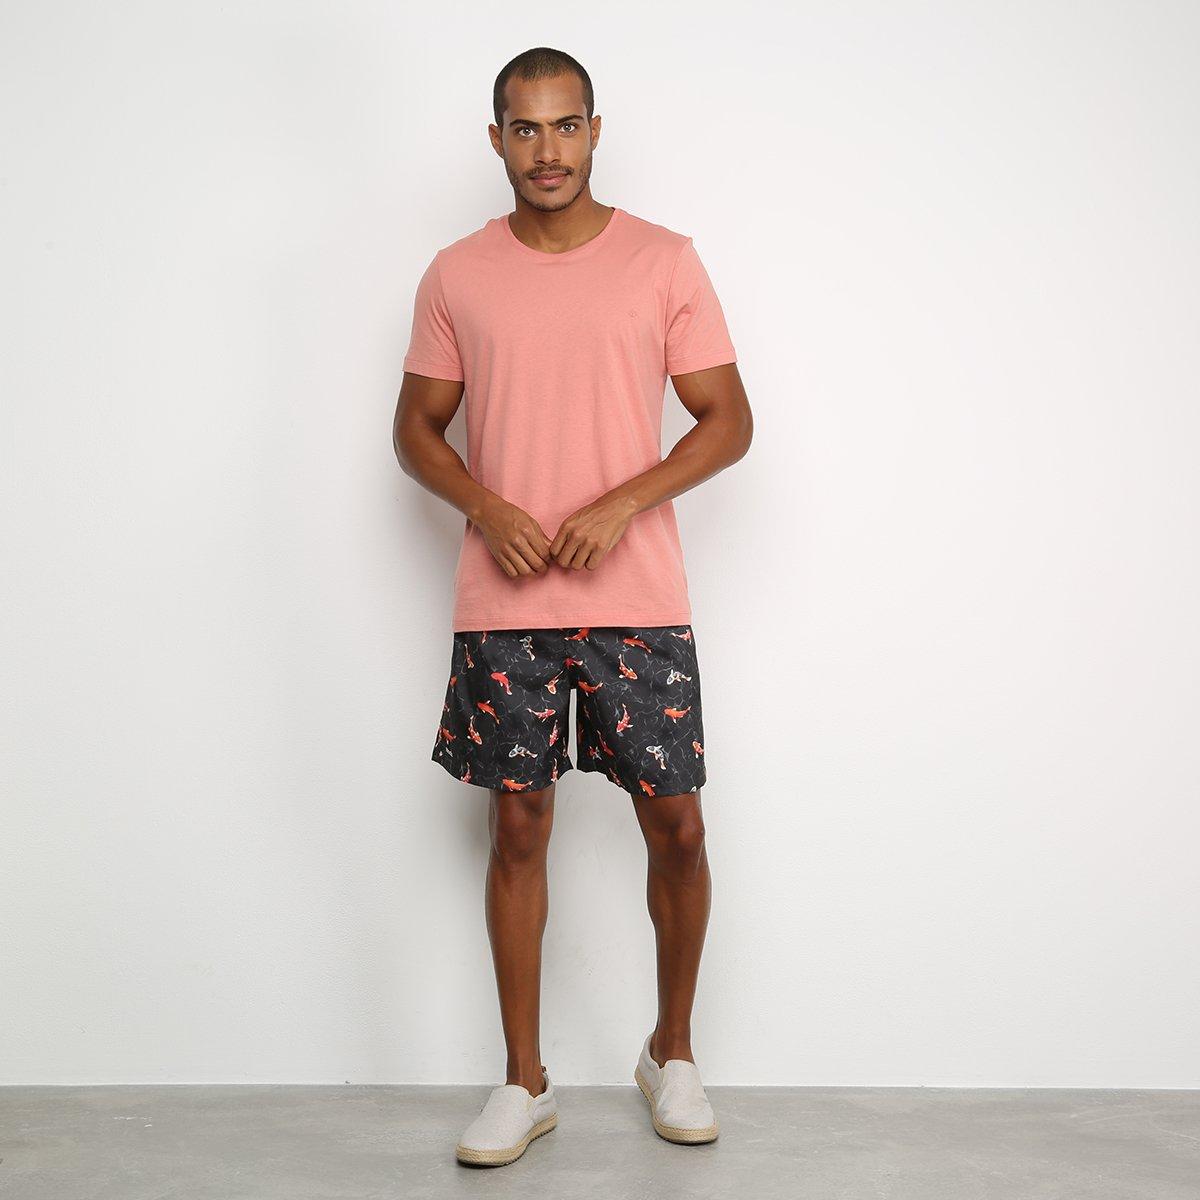 Shorts Mash Estampado Peixes Masculino - Preto